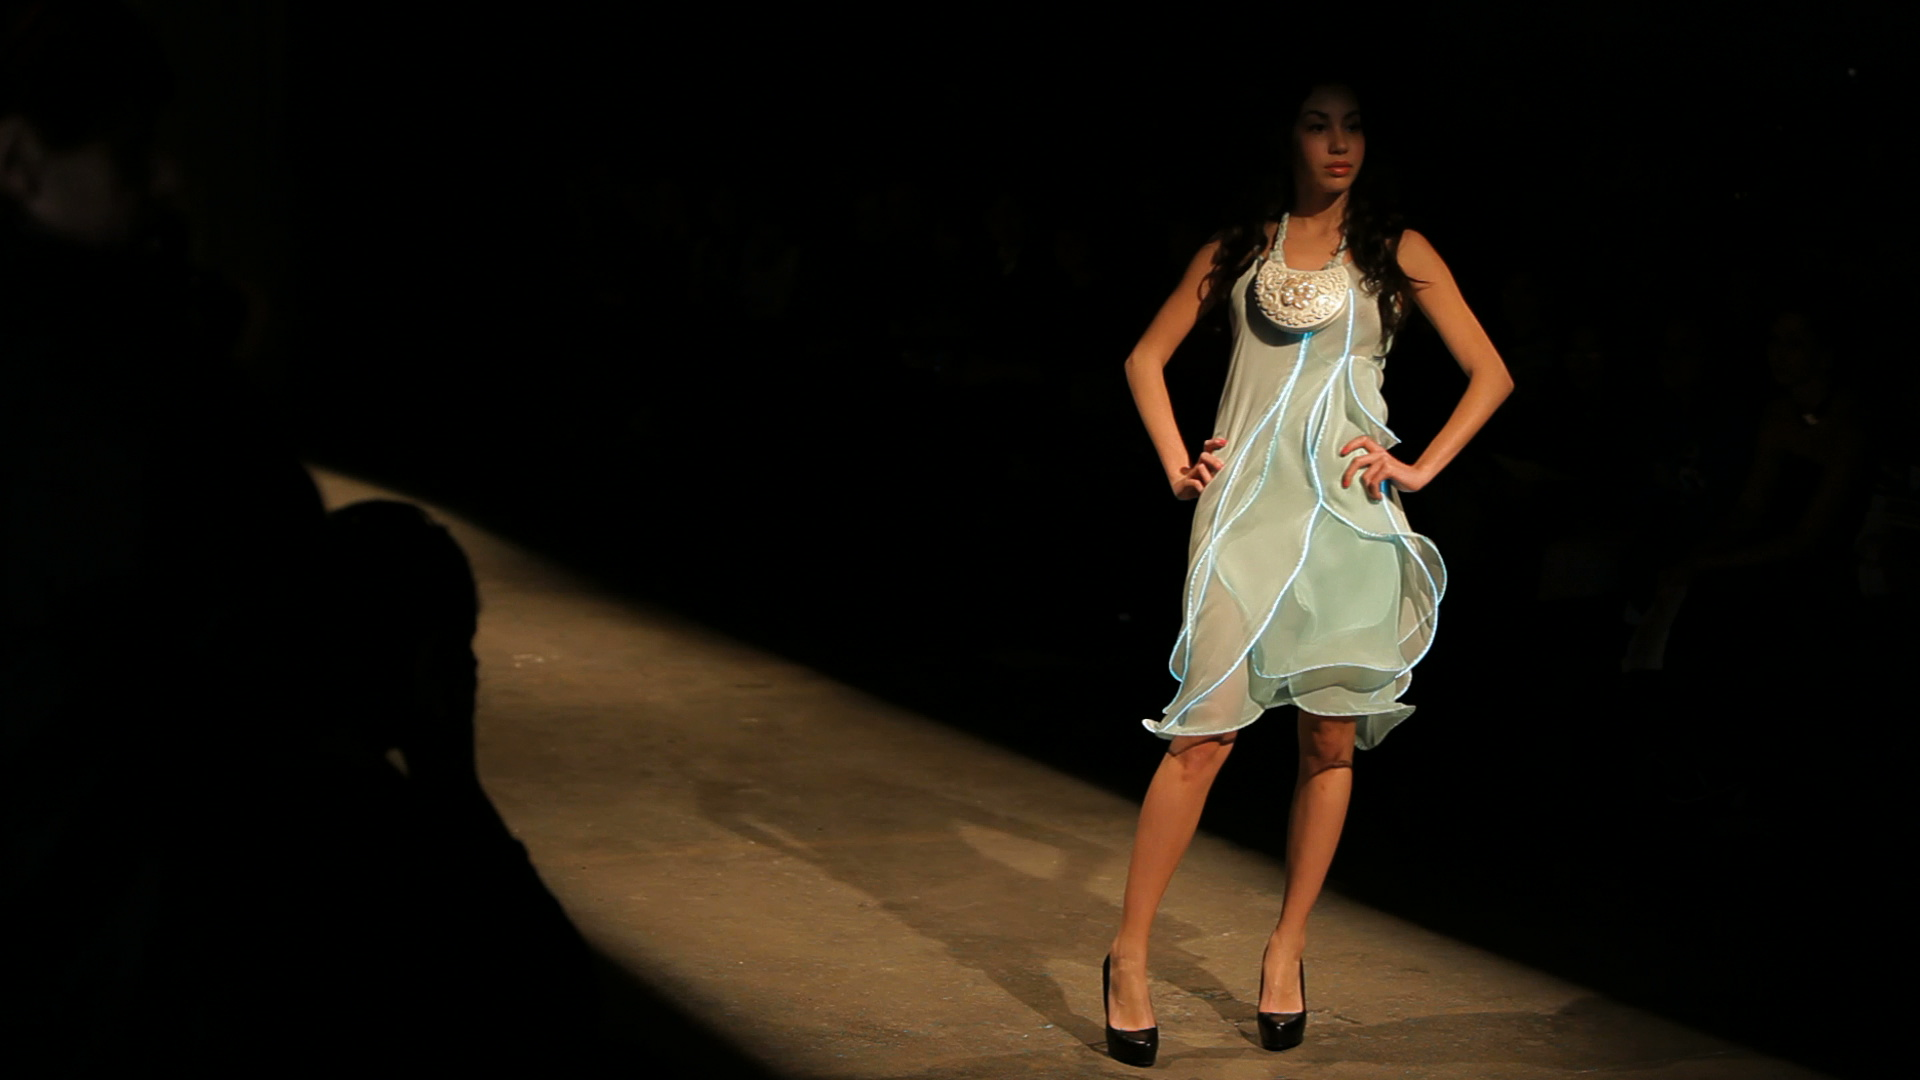 Diana_Eng_-_Fairytale_Fashion.jpg